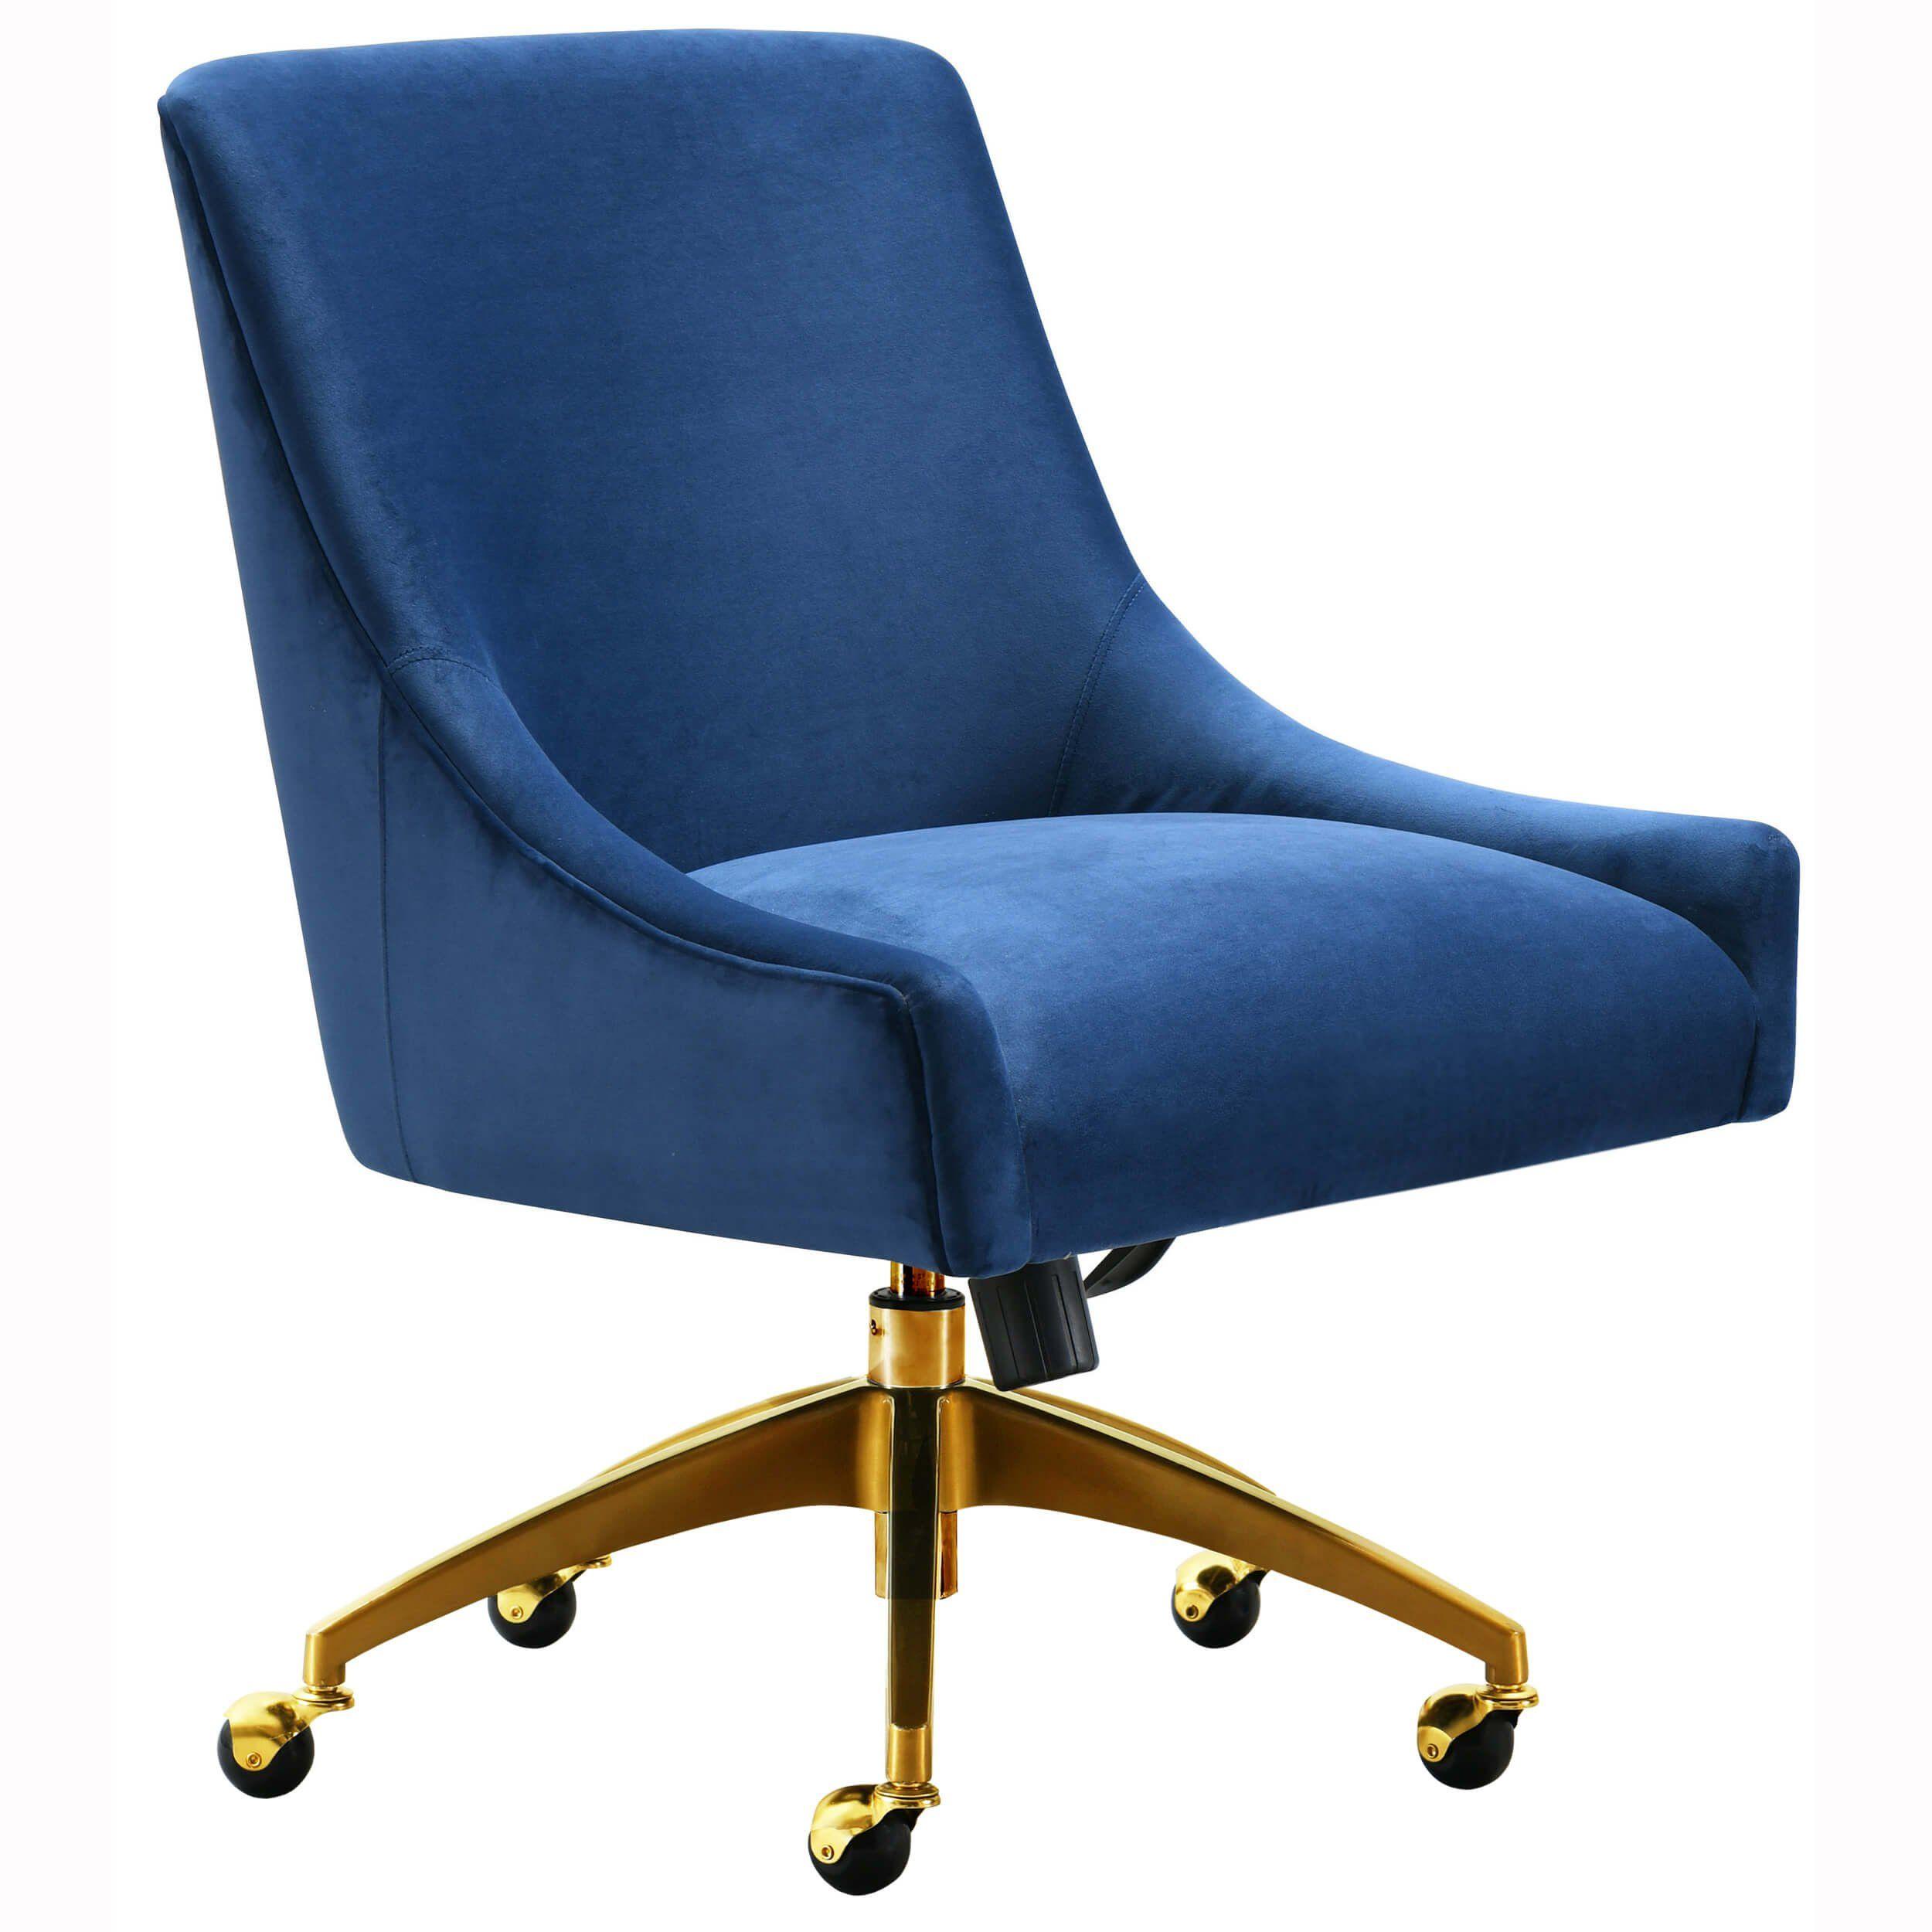 Beatrix Swivel Office Chair Navy Modern Office Chair Swivel